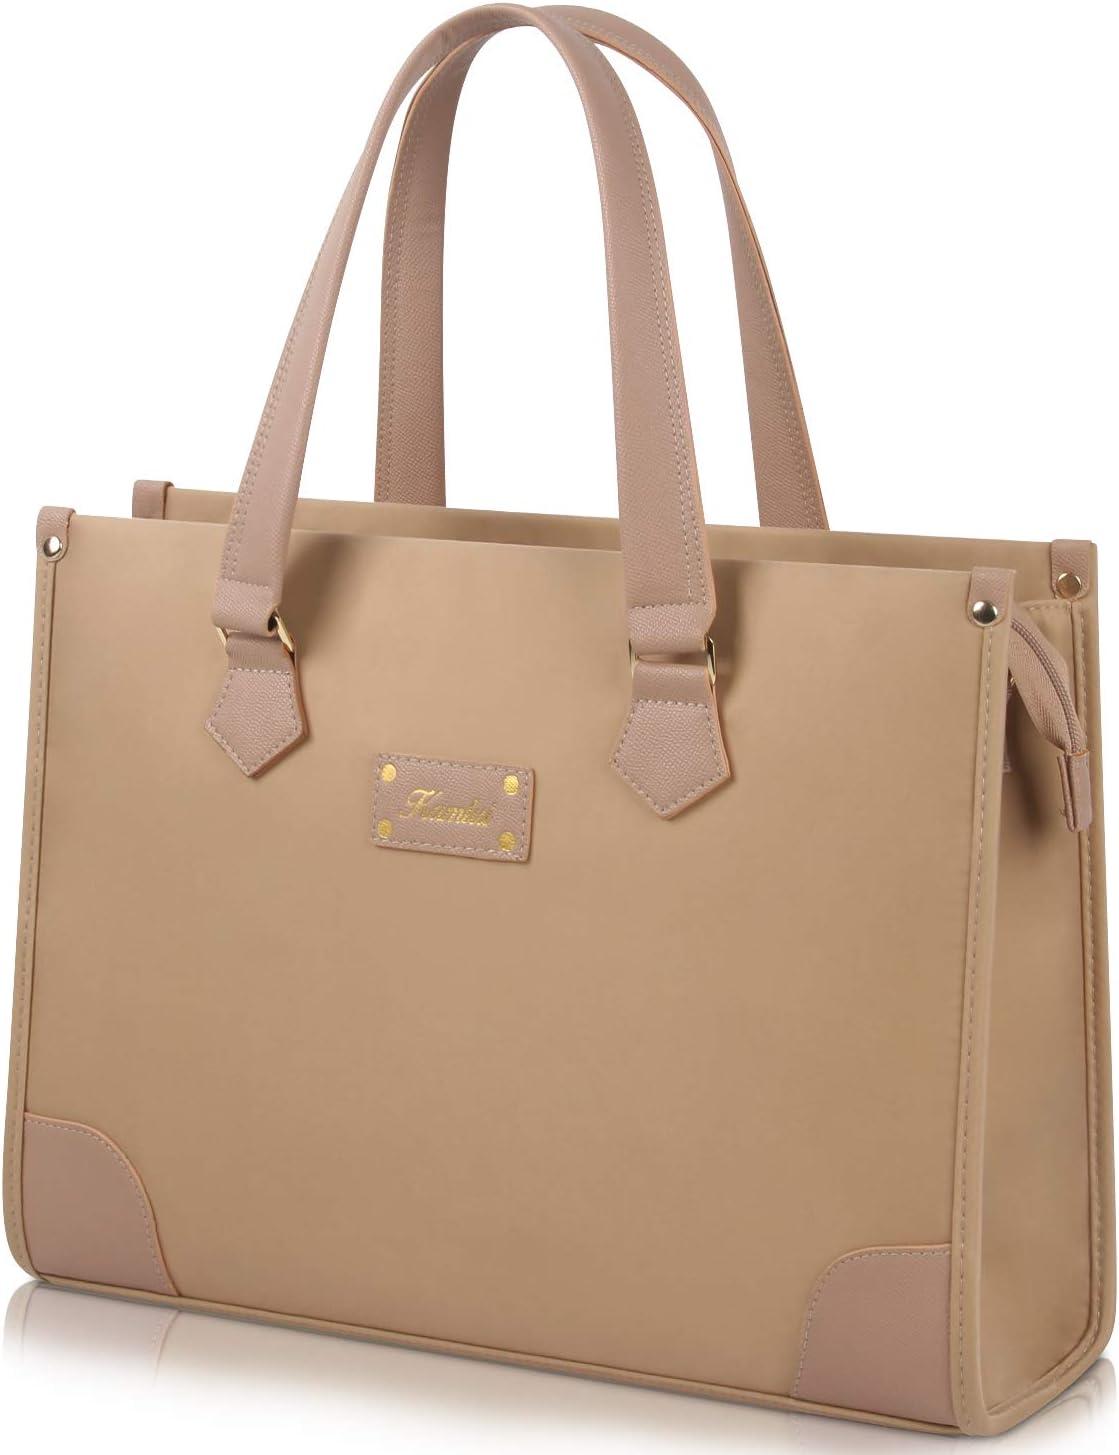 Kamlui 15.6 inch Laptop Bag for Women Computer Case Waterproof Shoulder Messenger Leather Tote Business Office Briefcase Large Capacity Bag,Khaki